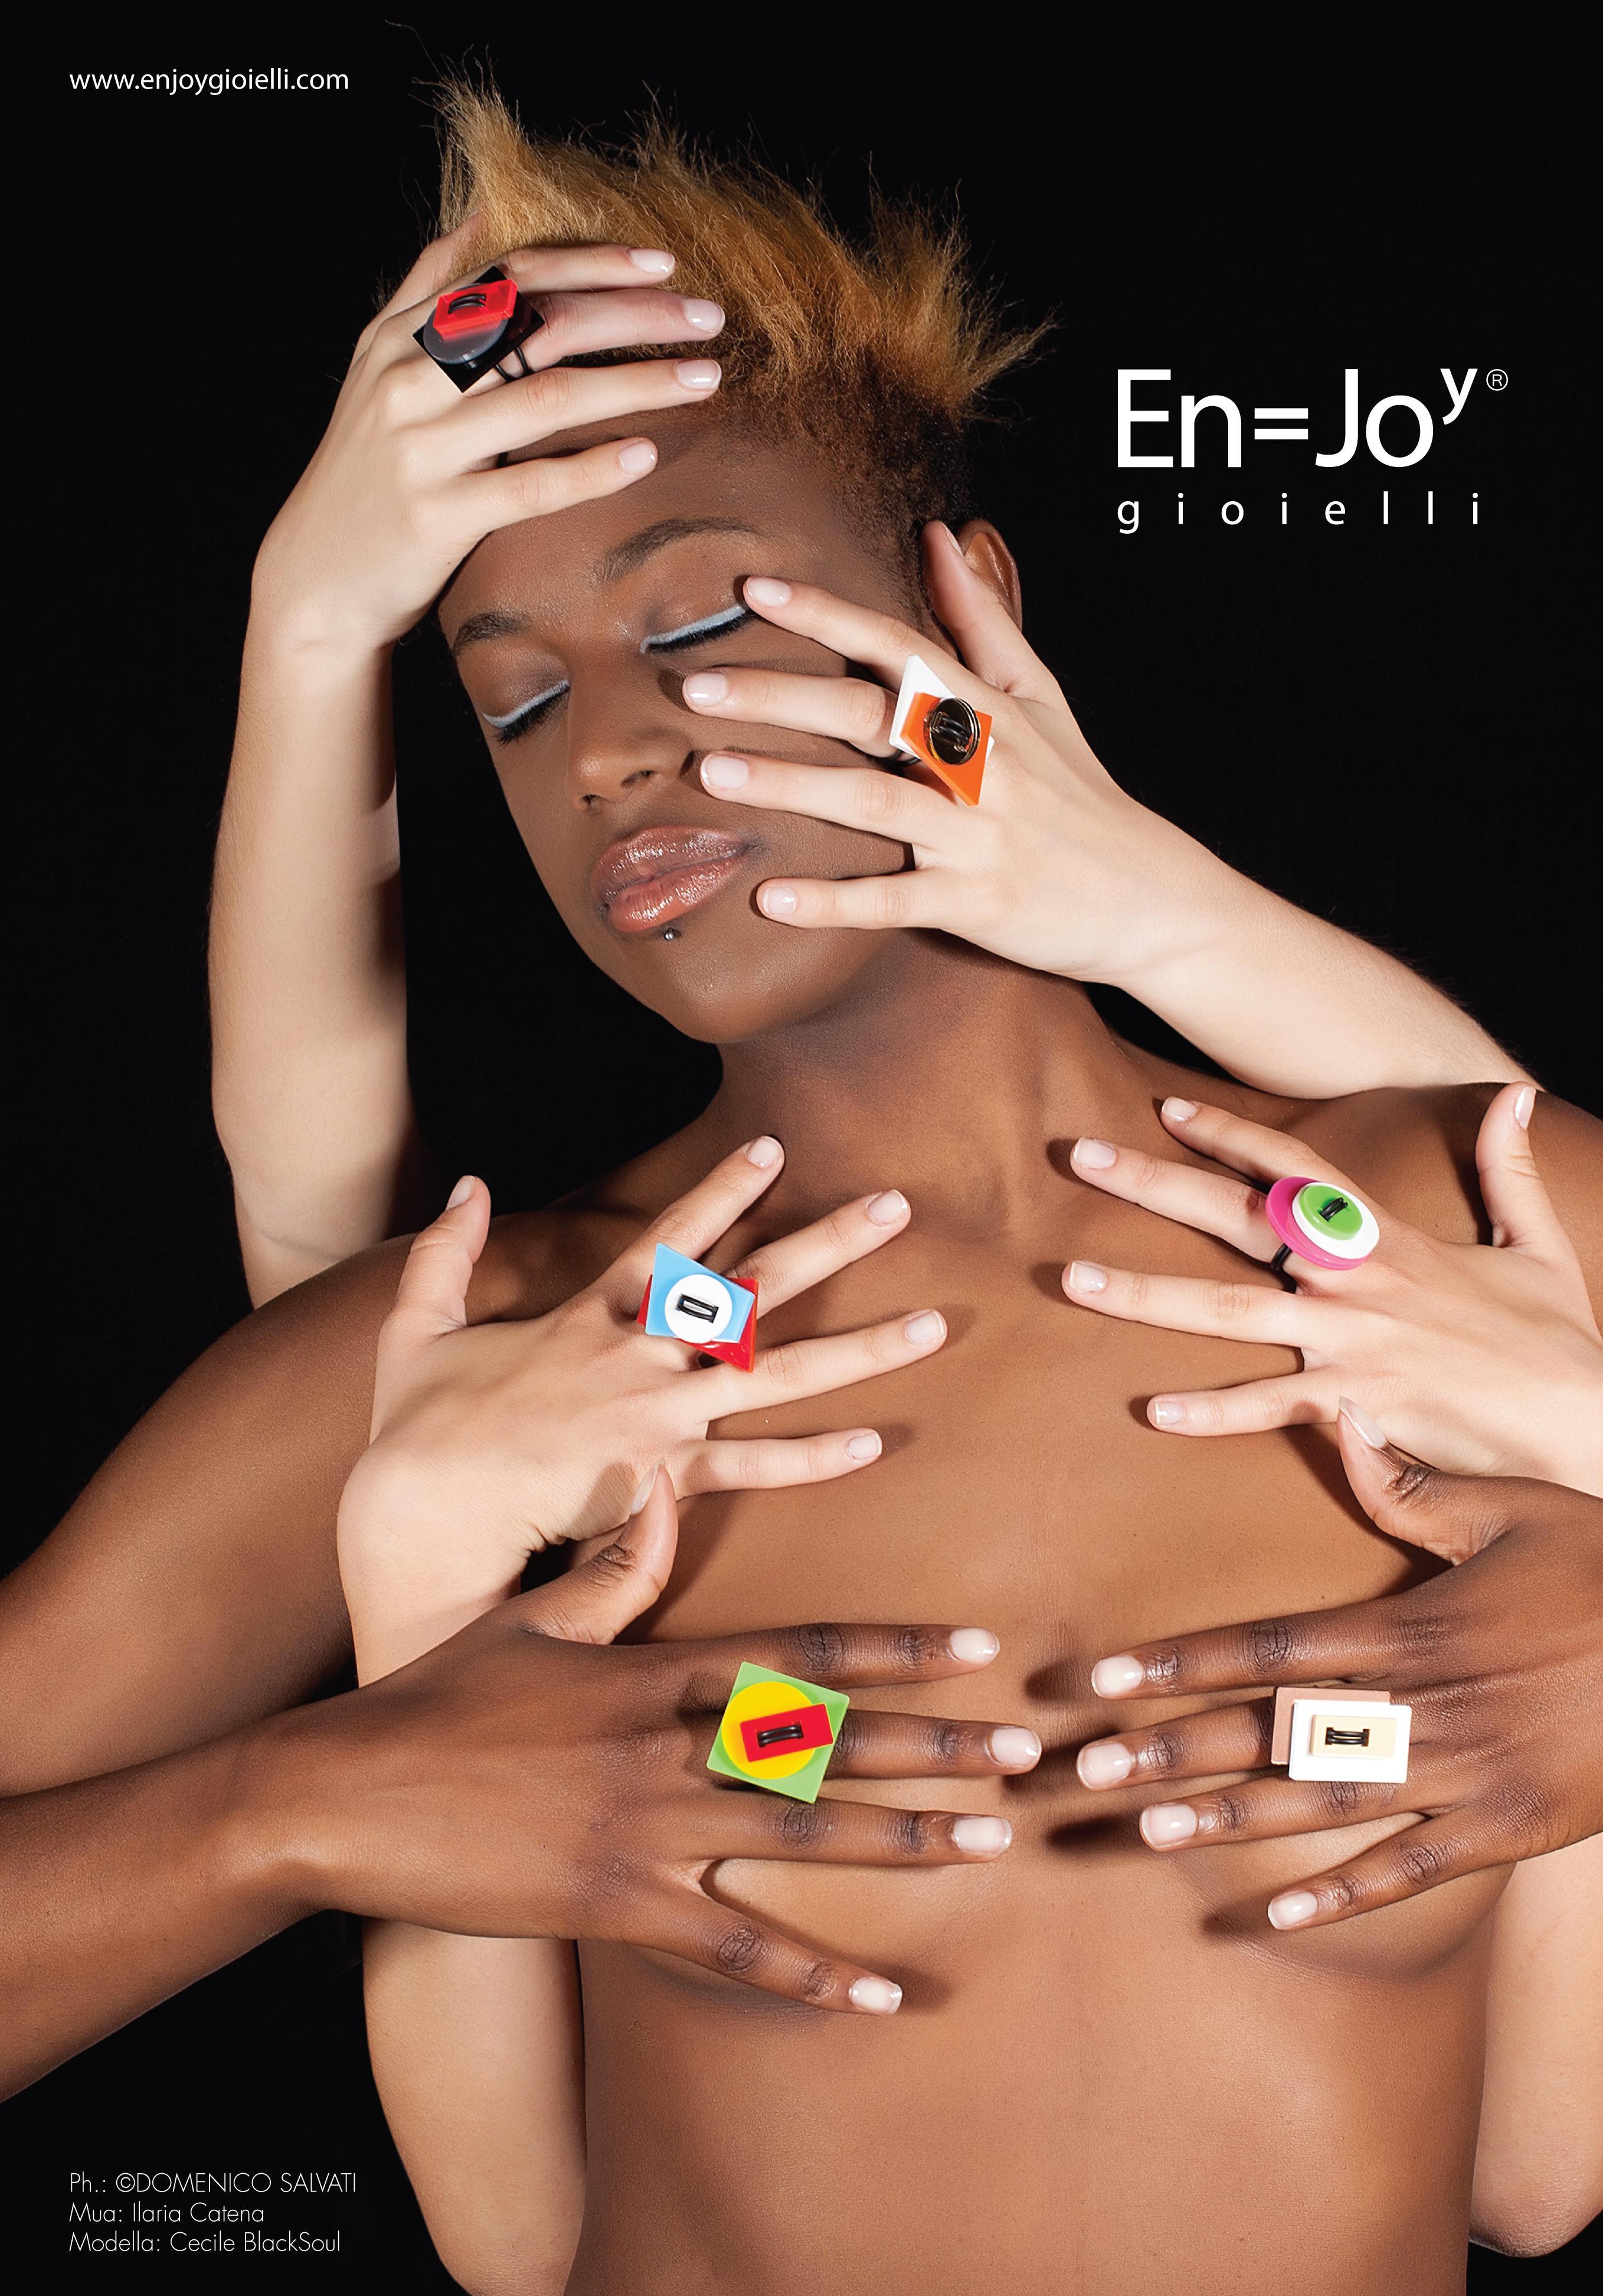 En=Joy® gioielli